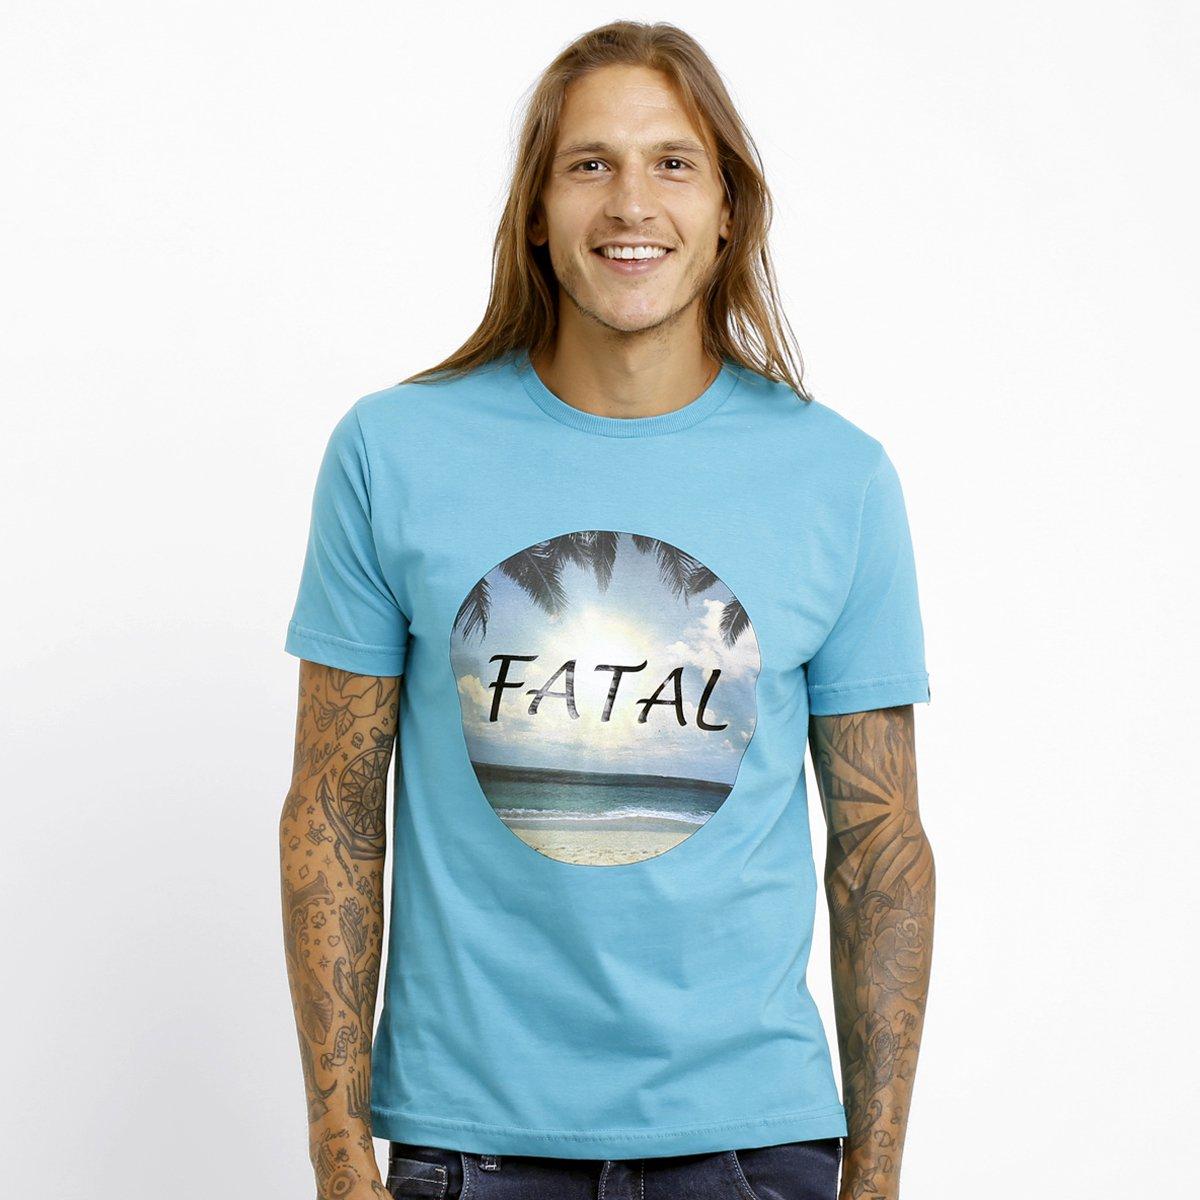 5aa3034009 Camiseta Fatal Estampada - Compre Agora